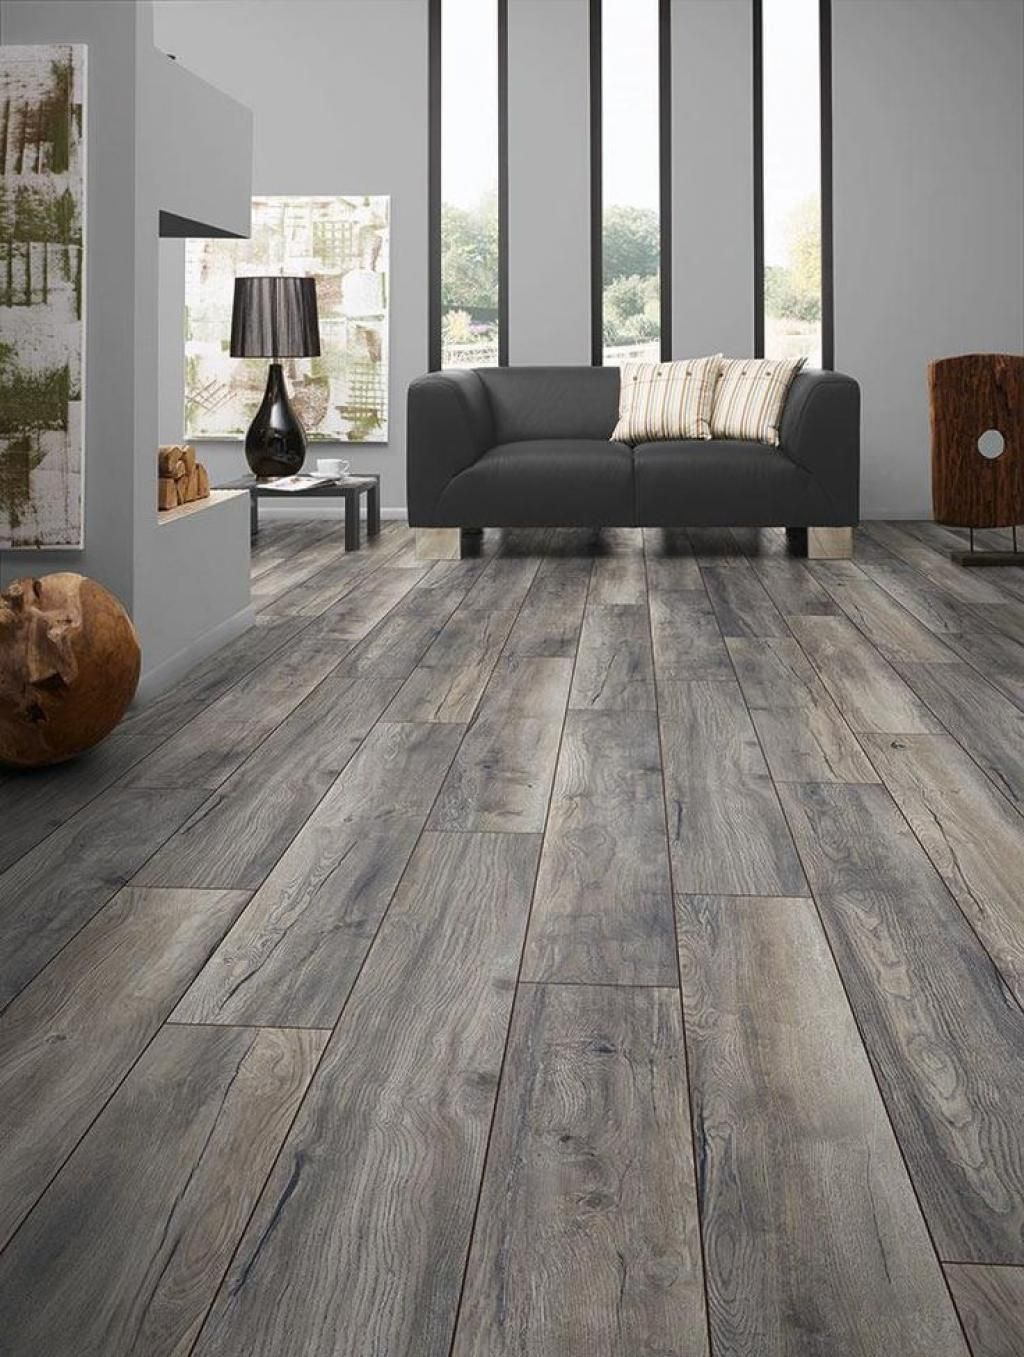 How To Installing Laminate Flooring House Flooring Grey